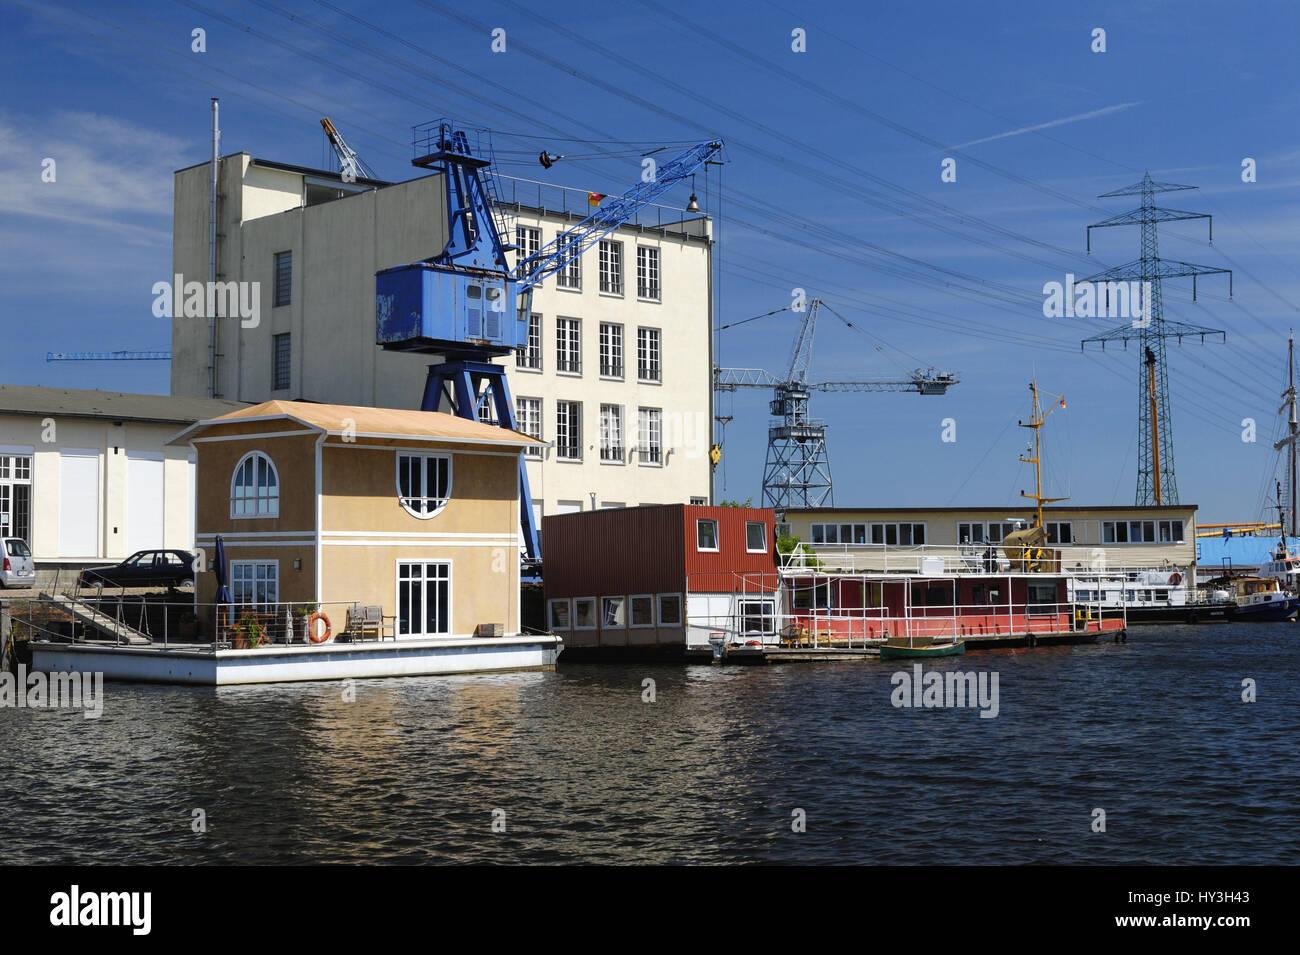 Pilot's canal in the Harburger inland harbour in castle Har, Hamburg, Germany, Europe, Lotsekanal im Harburger - Stock Image